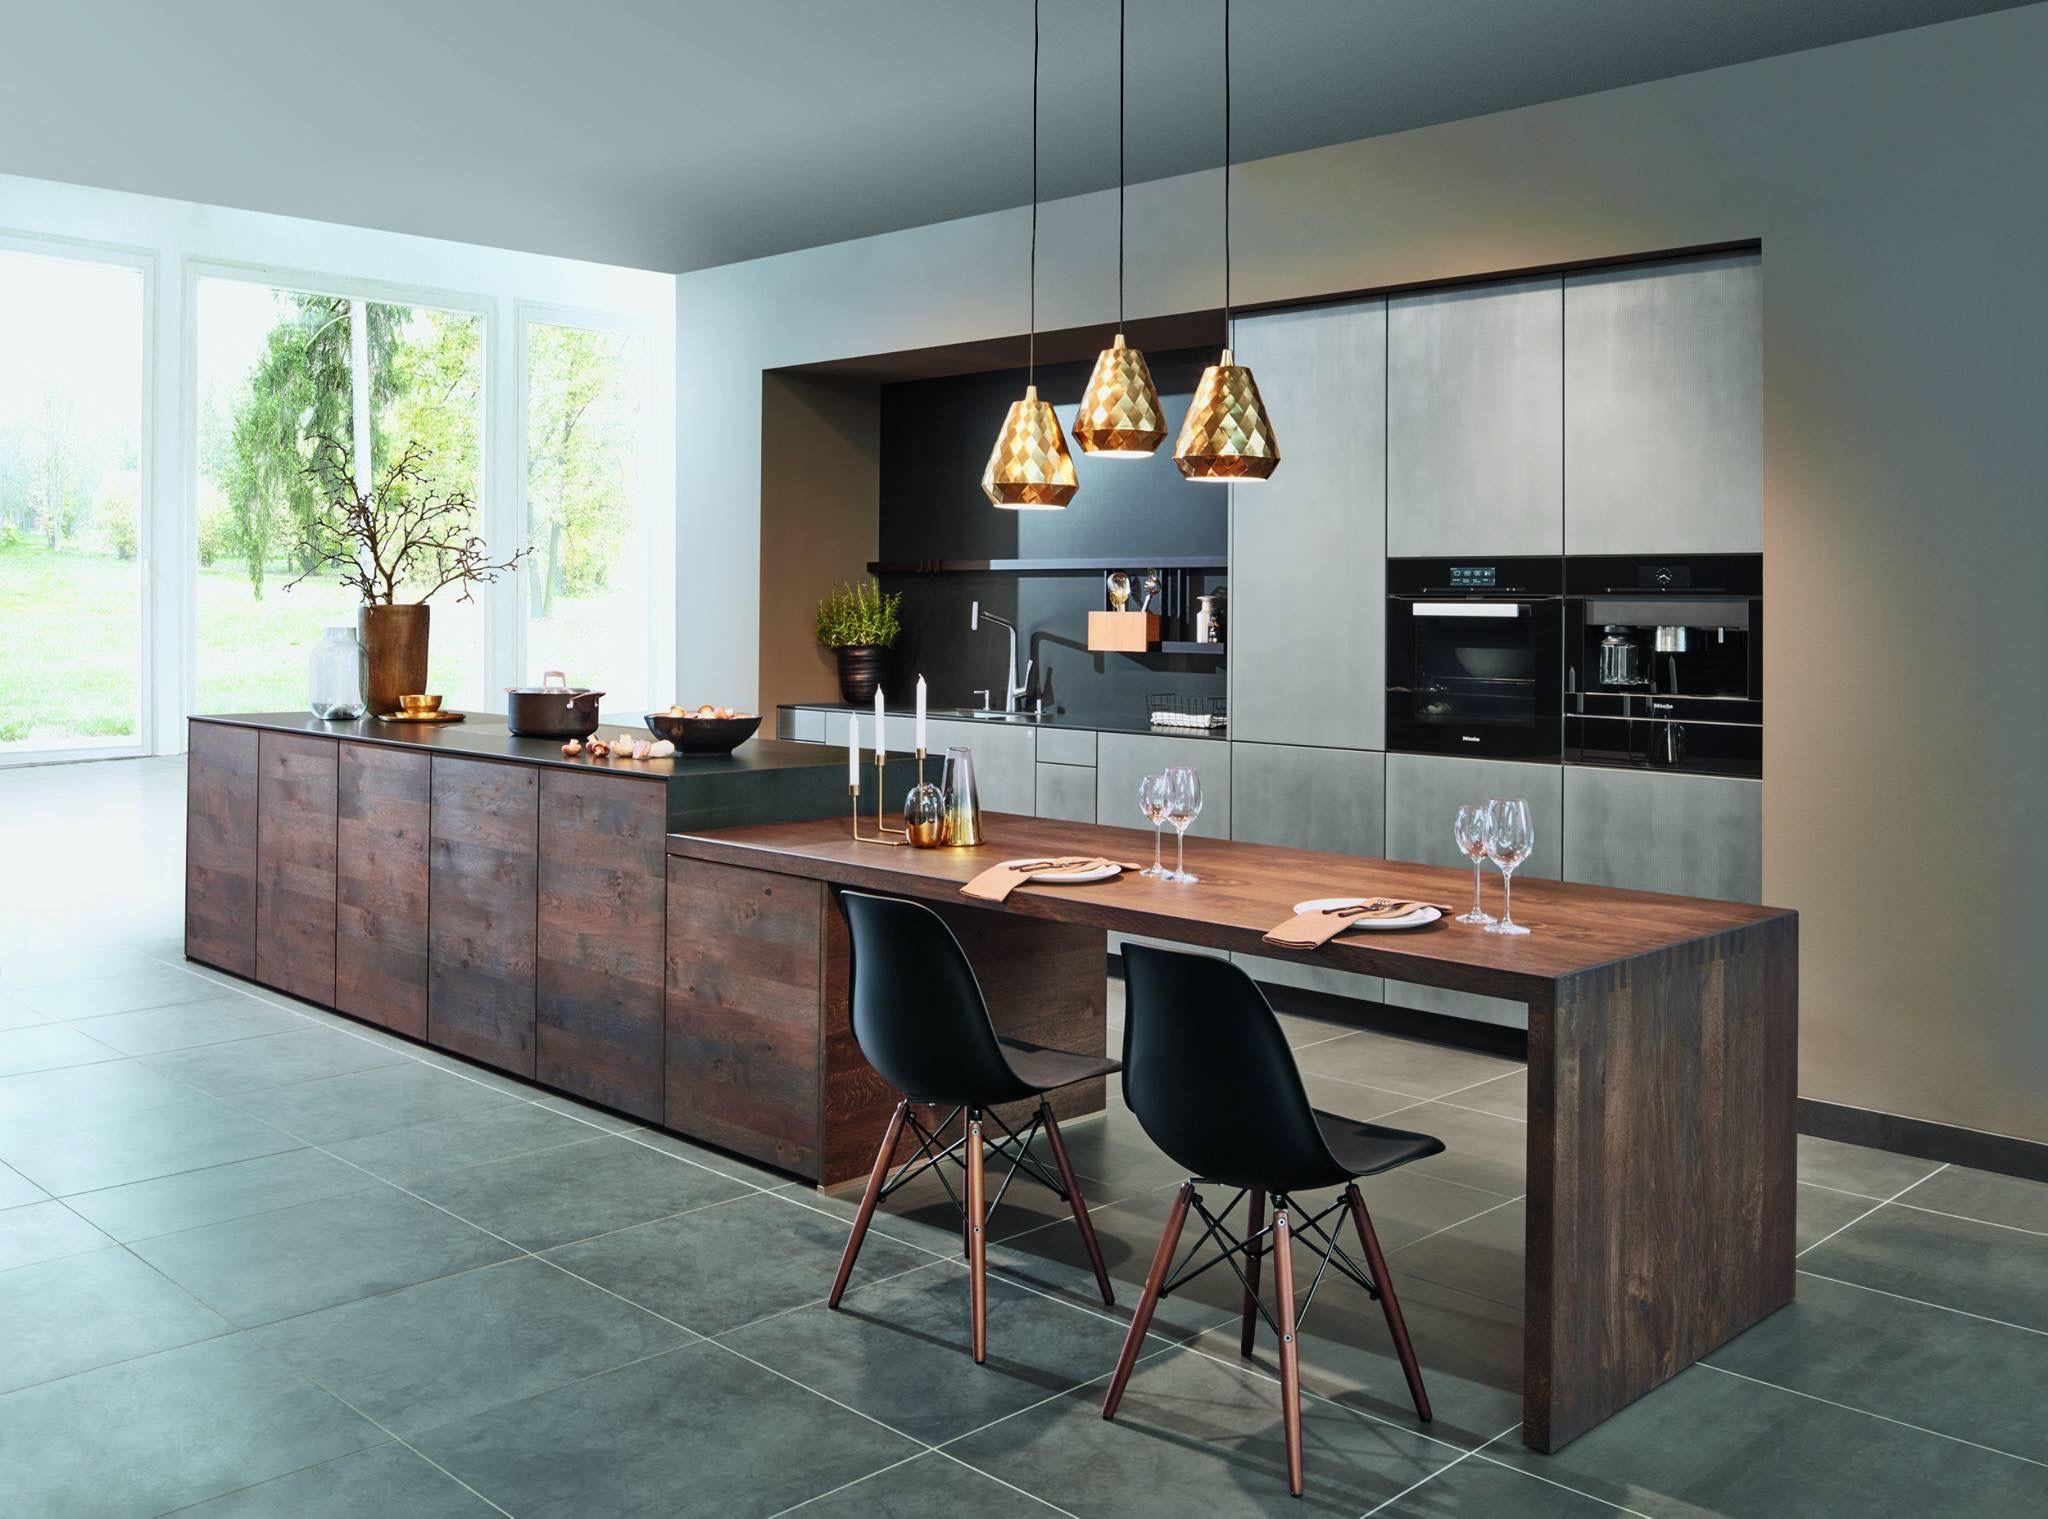 Modernes zen-küchendesign arrital cuisine phoenix  recherche google  déco  cuisine